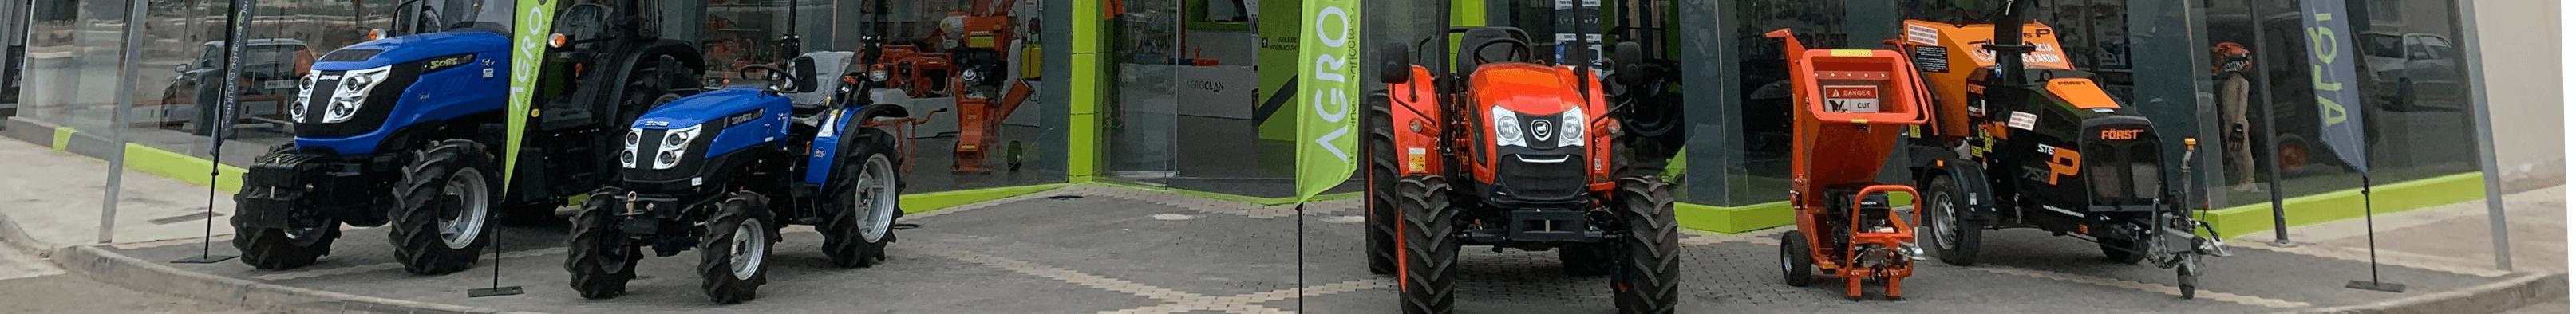 tienda-agricola-bosque-jardin-murcia-agroclan